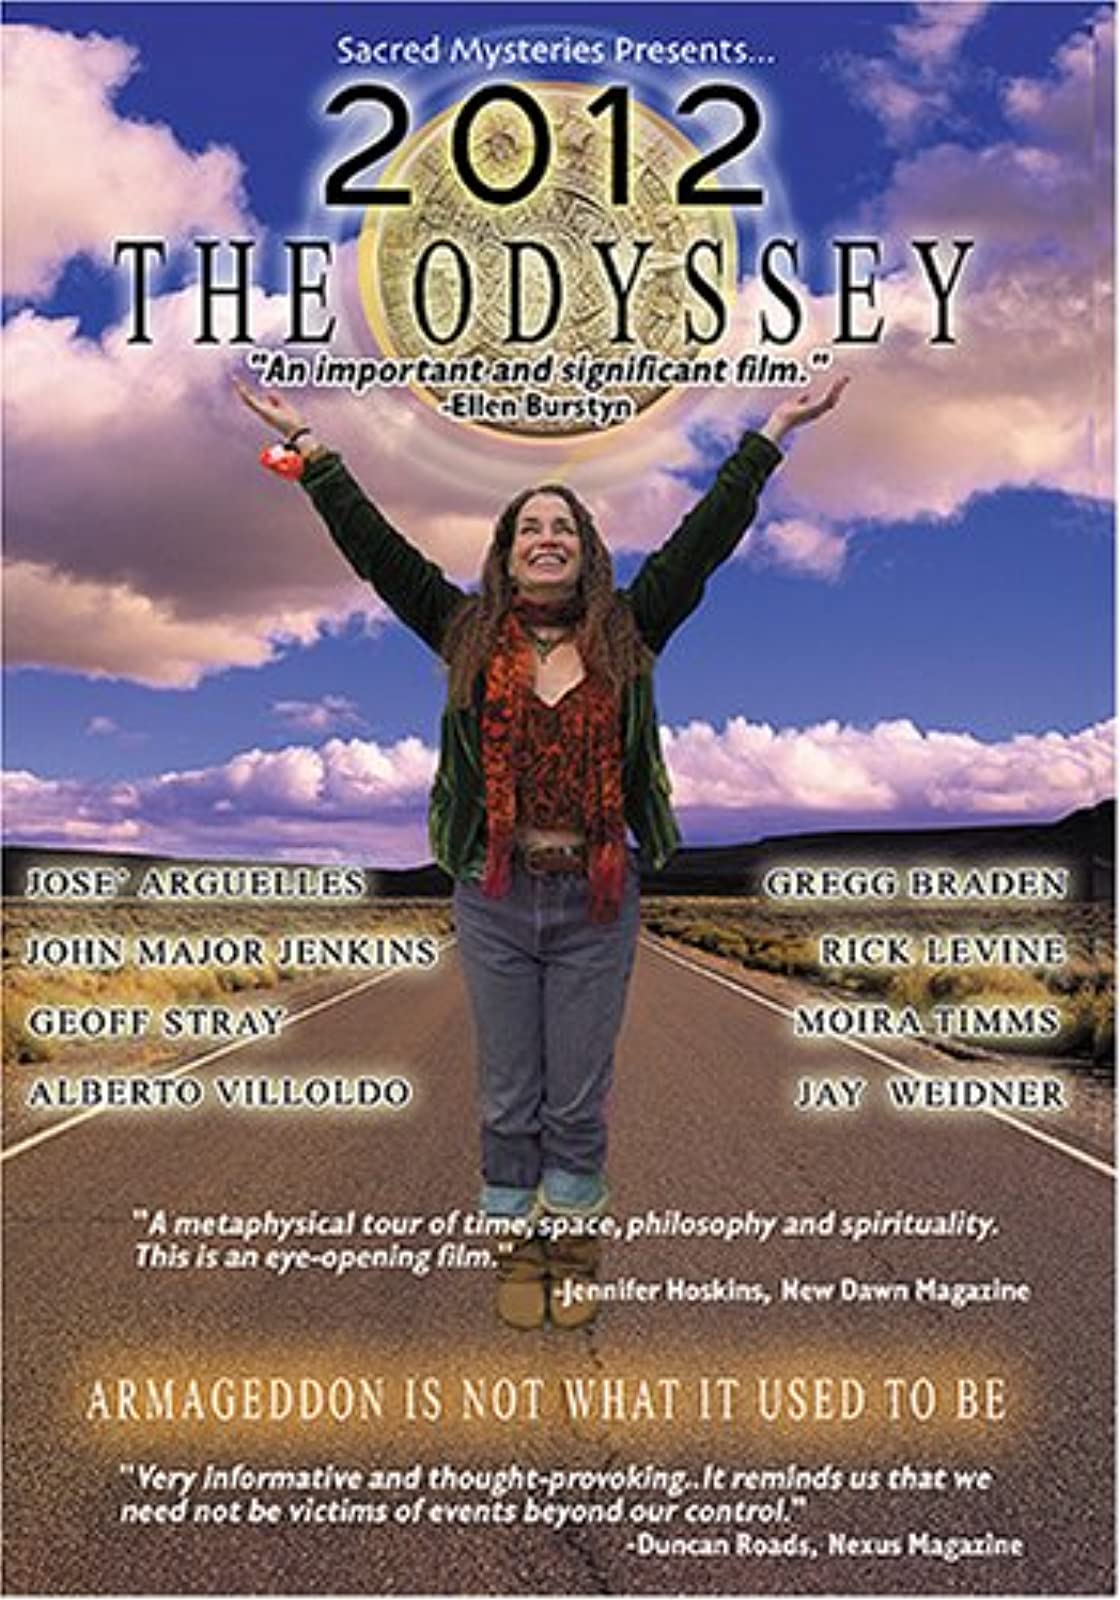 2012 The Odyssey On DVD with Gregg Braden